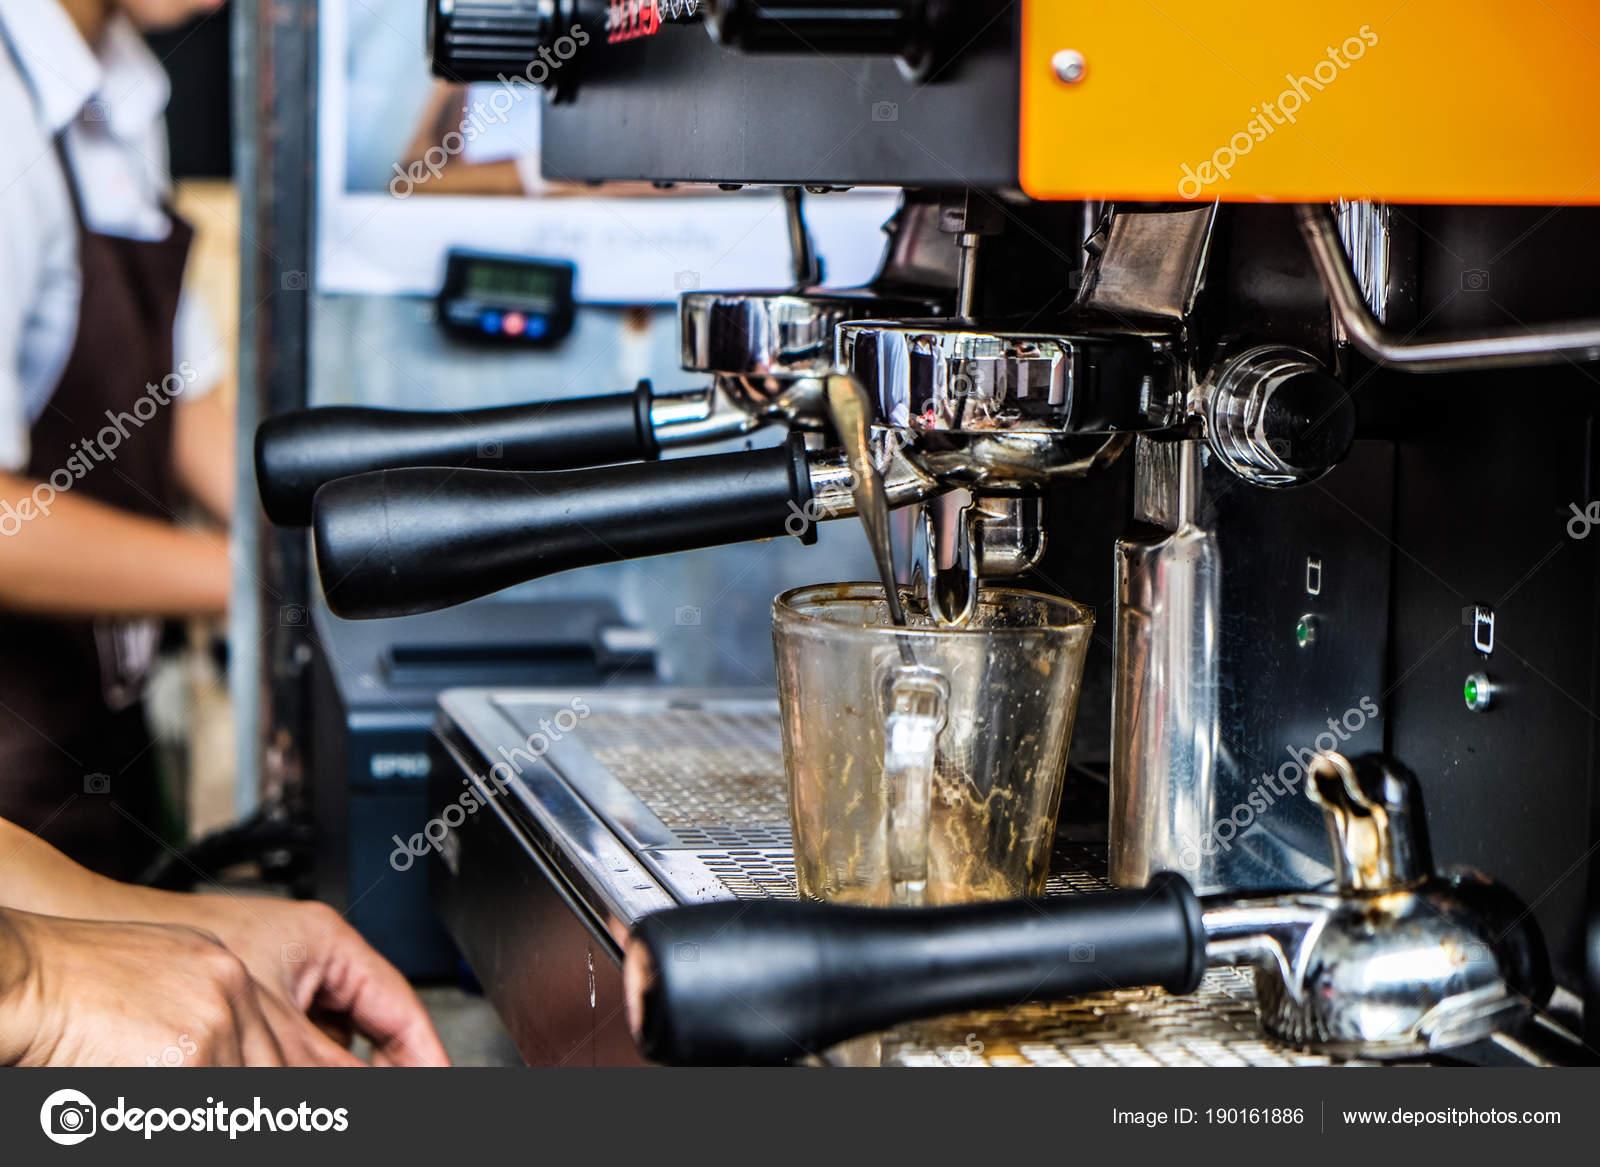 ed62c5fe021 Barista Του Cafe Κάνοντας Καφέ Προετοιμασία Βιομηχανία Ρούχων Τροφίμων Και–  εικόνα αρχείου